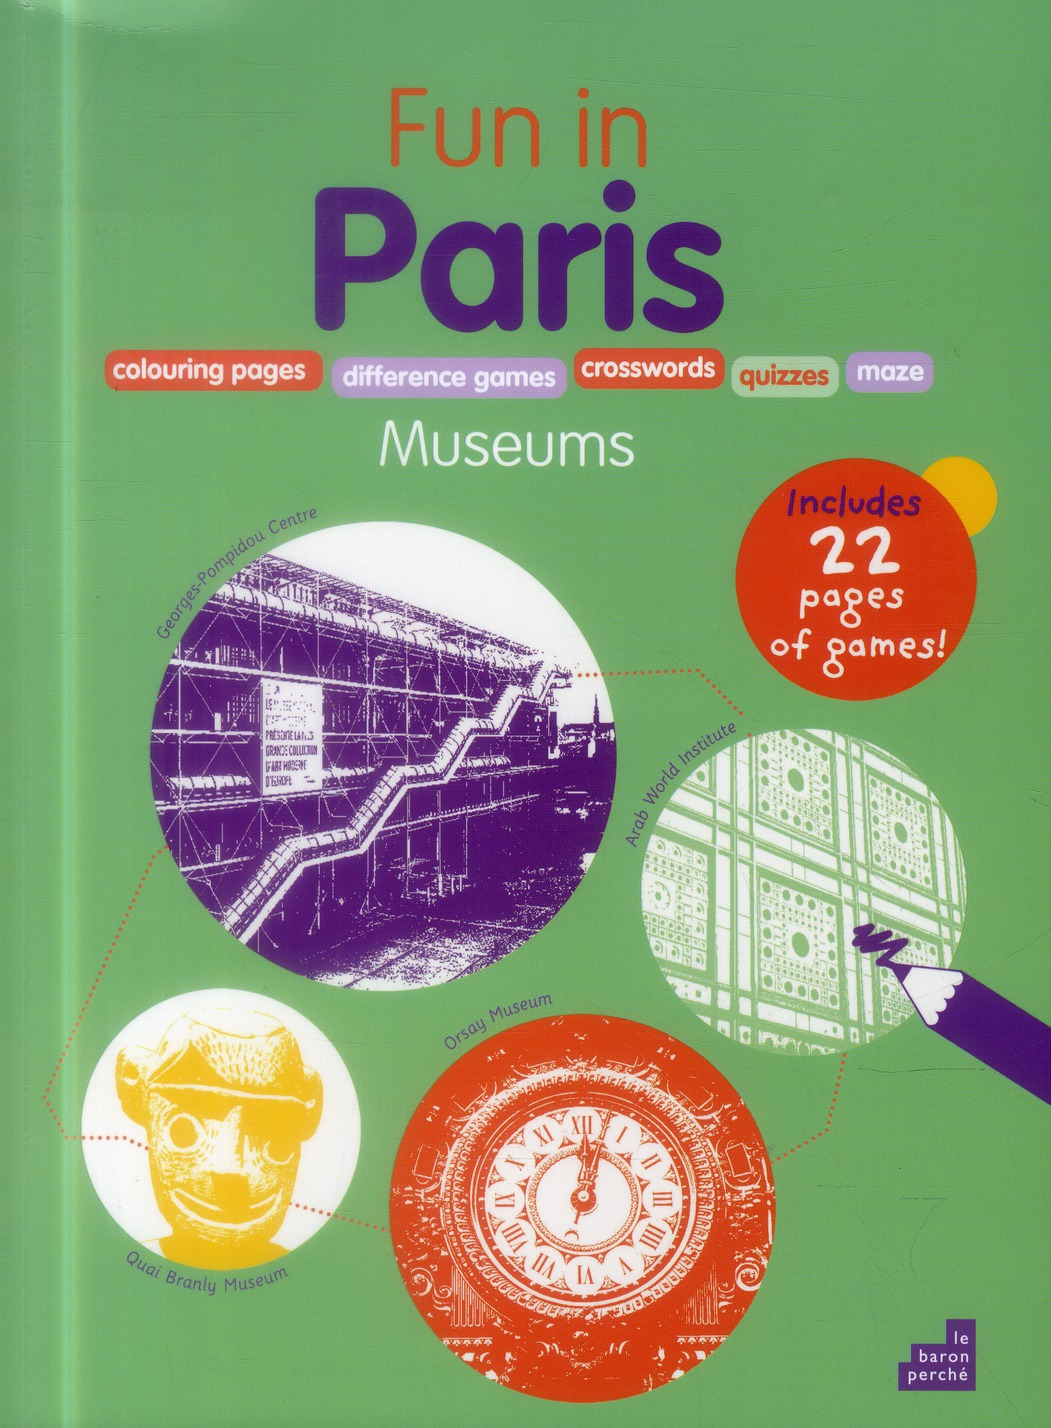 Fun in Paris ! ; museums